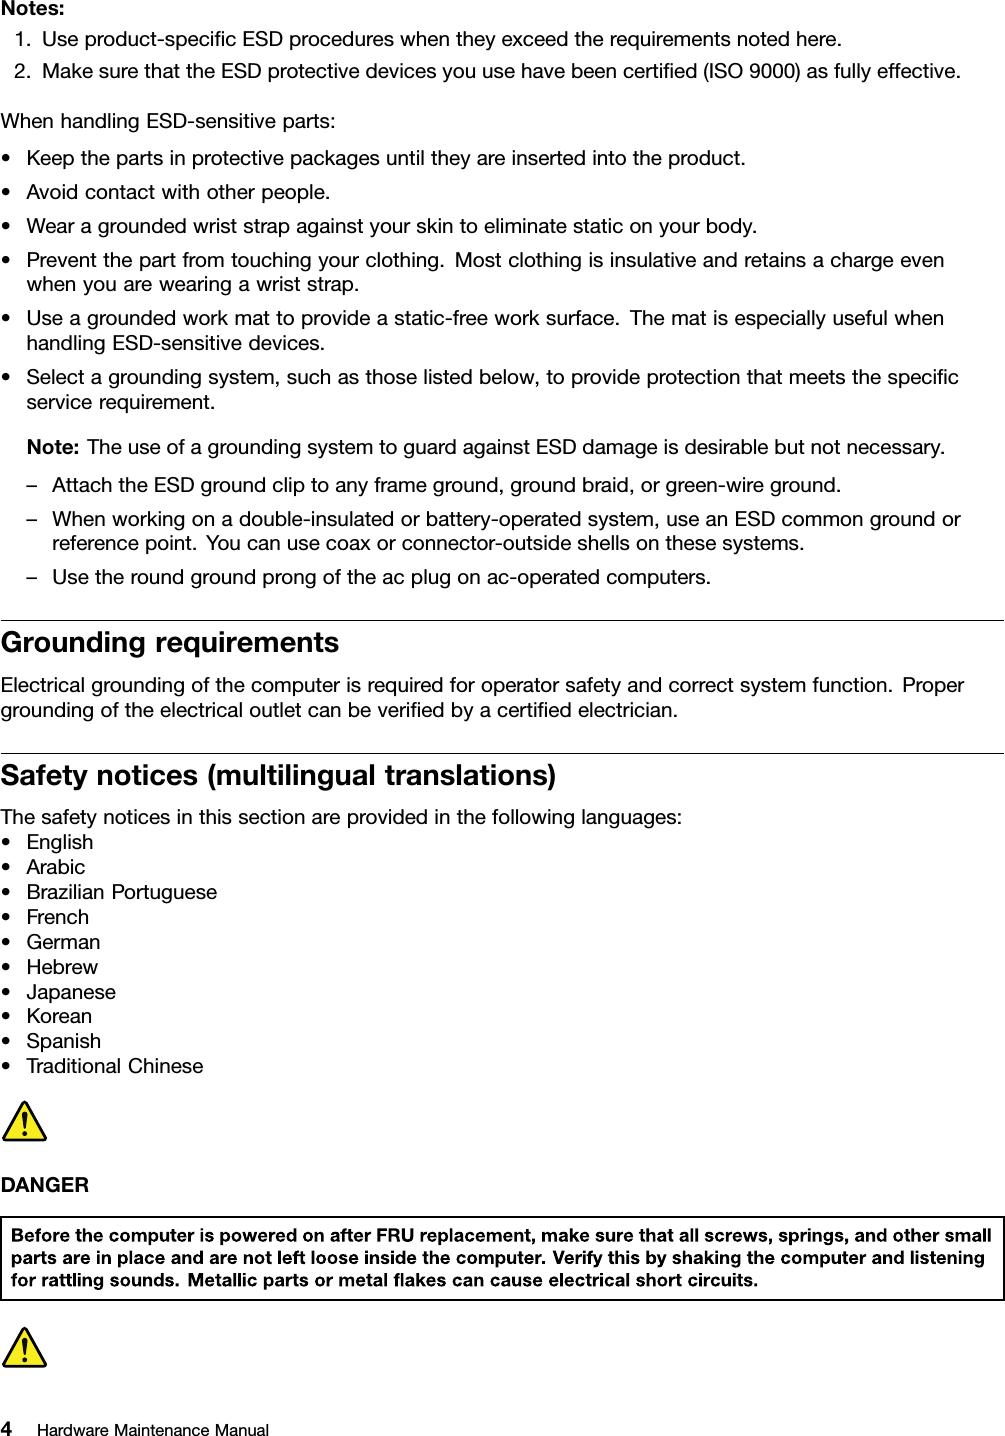 lenovo manual t530 ebook